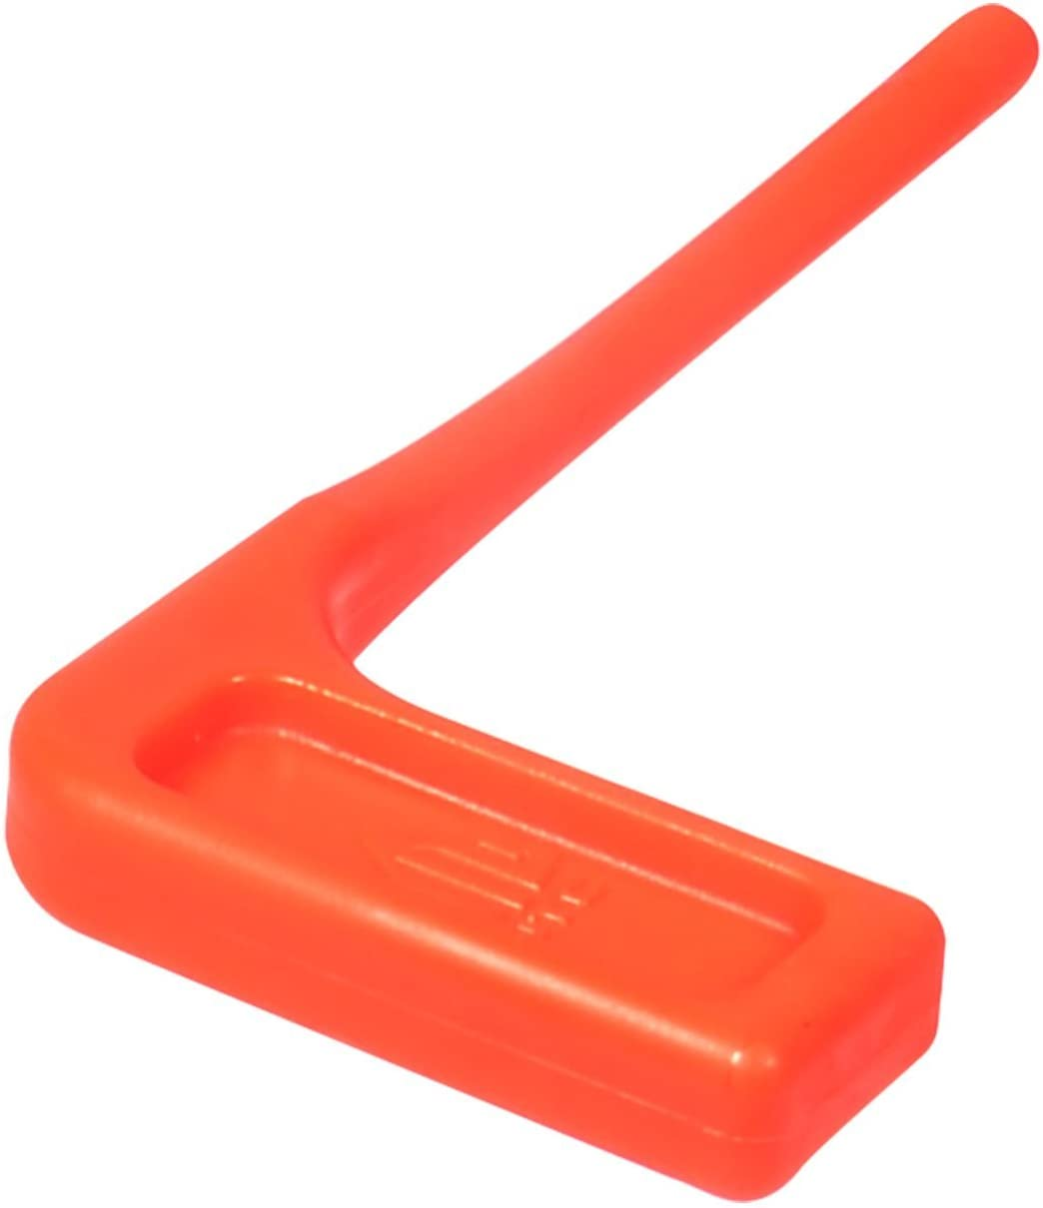 UTG Universal Firearm Chamber Safety Flag, Orange, 6PCs/Set